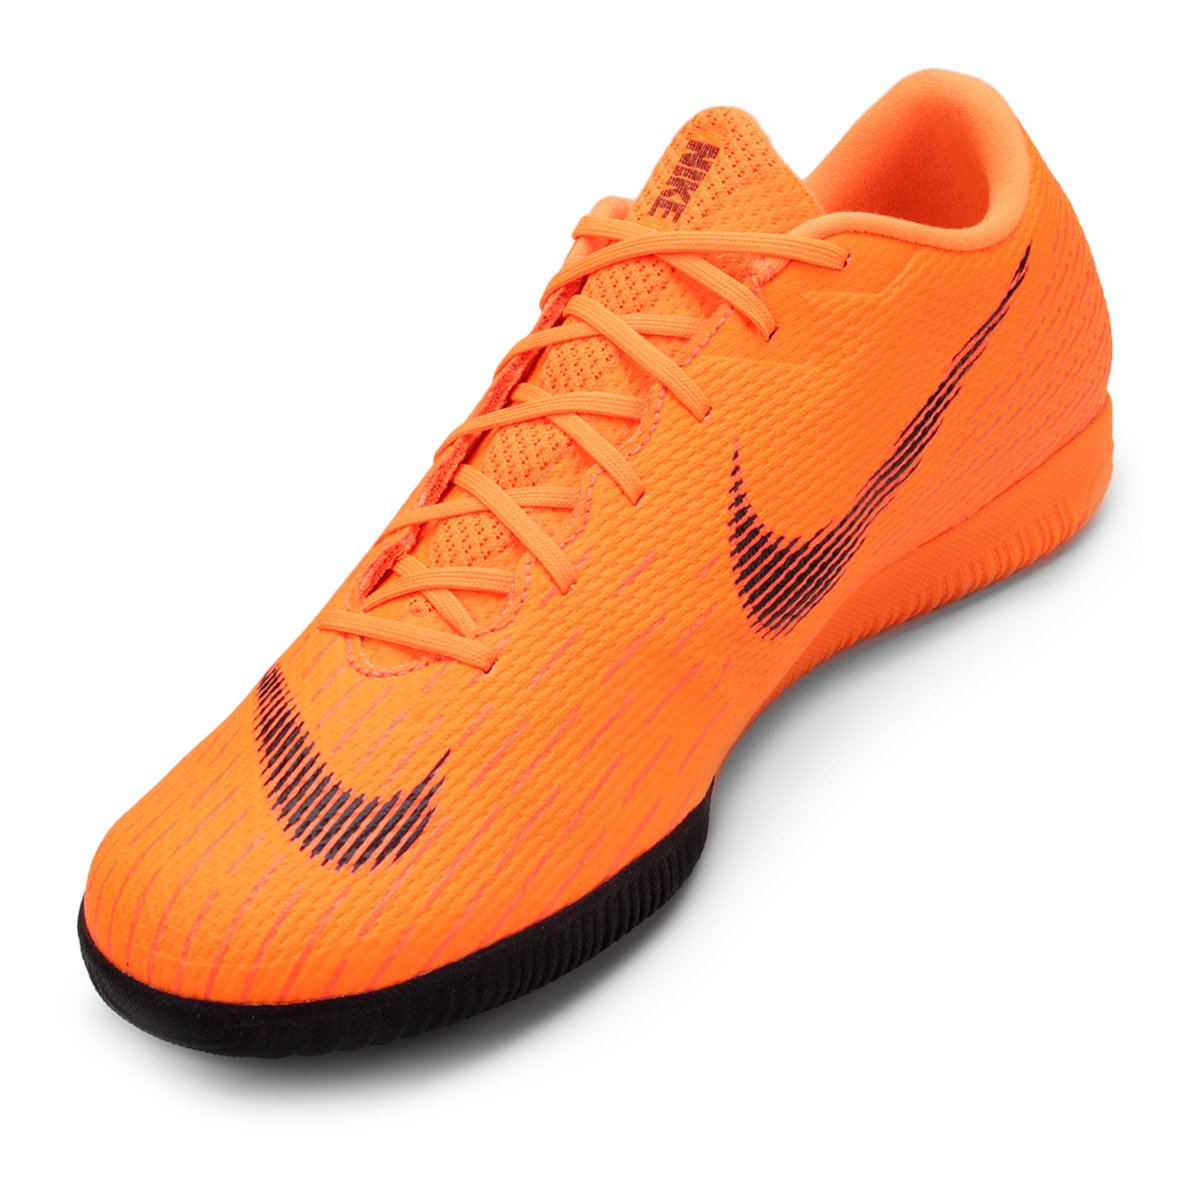 Chuteira Futsal Nike Mercurial Vapor 12 Academy - Laranja e Preto ... 2fdd04aa14aa4